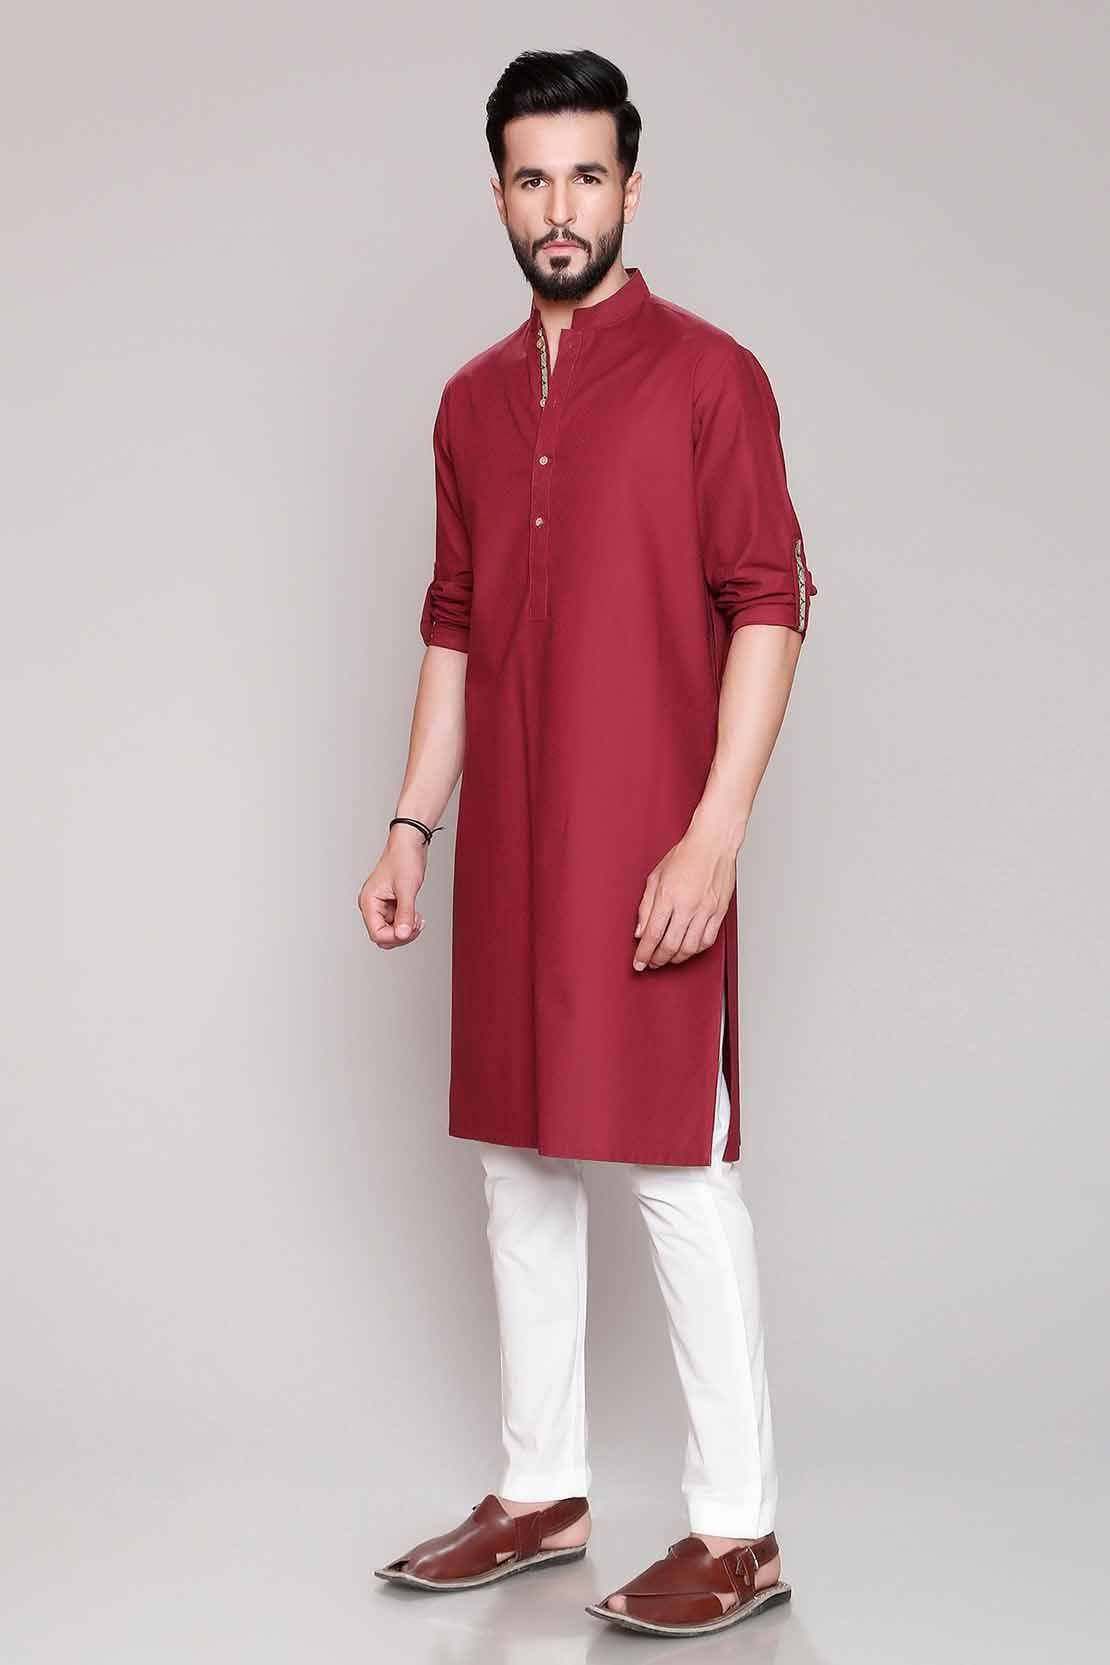 3b46bce457 Latest Eid Men Kurta Shalwar Kameez Designs New Collection 2019-2020 ...